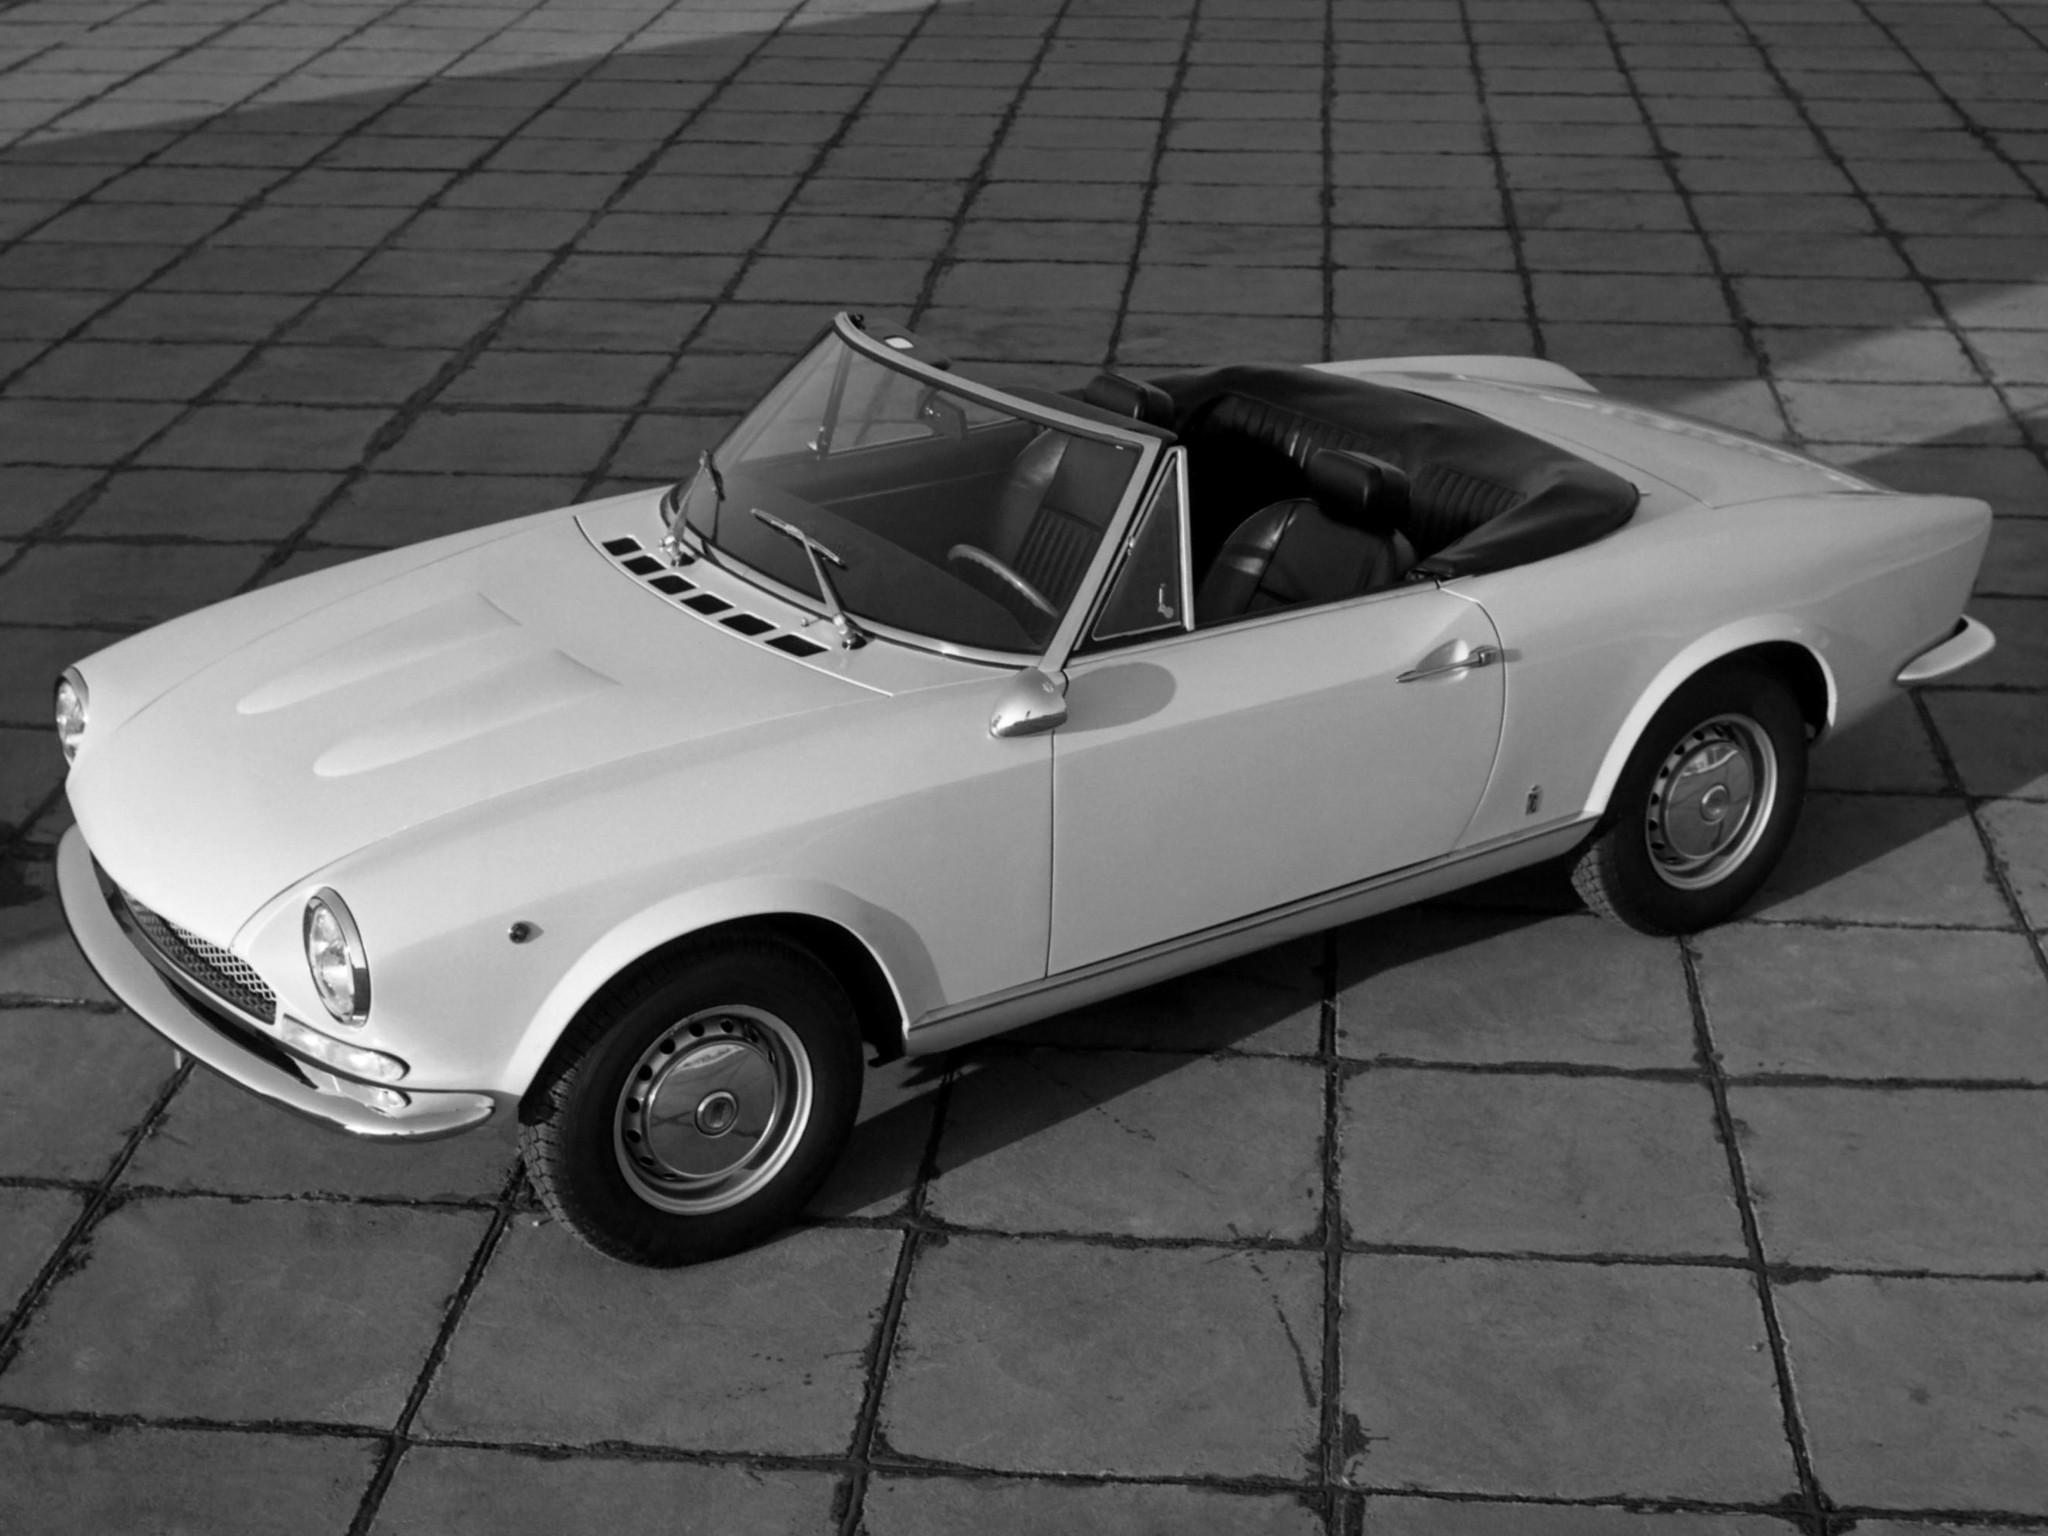 Green Buick Gmc >> FIAT 124 Sport Spider - 1969, 1970, 1971, 1972 - autoevolution